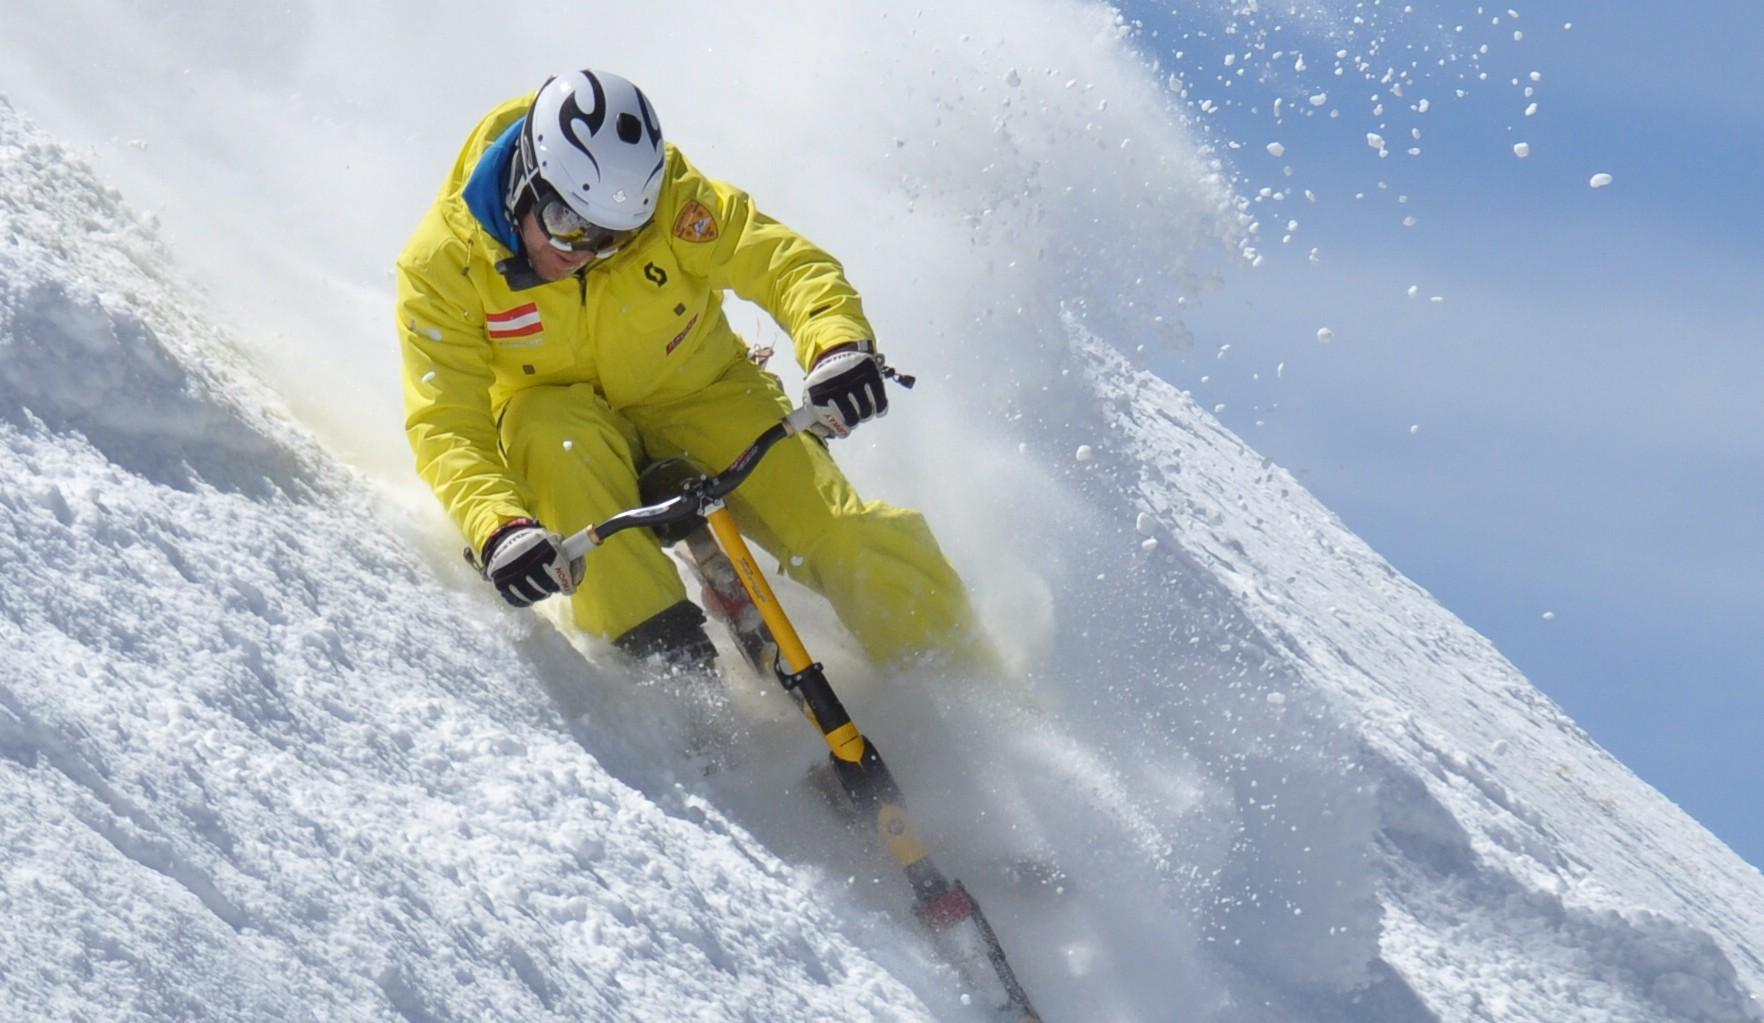 Snow biken